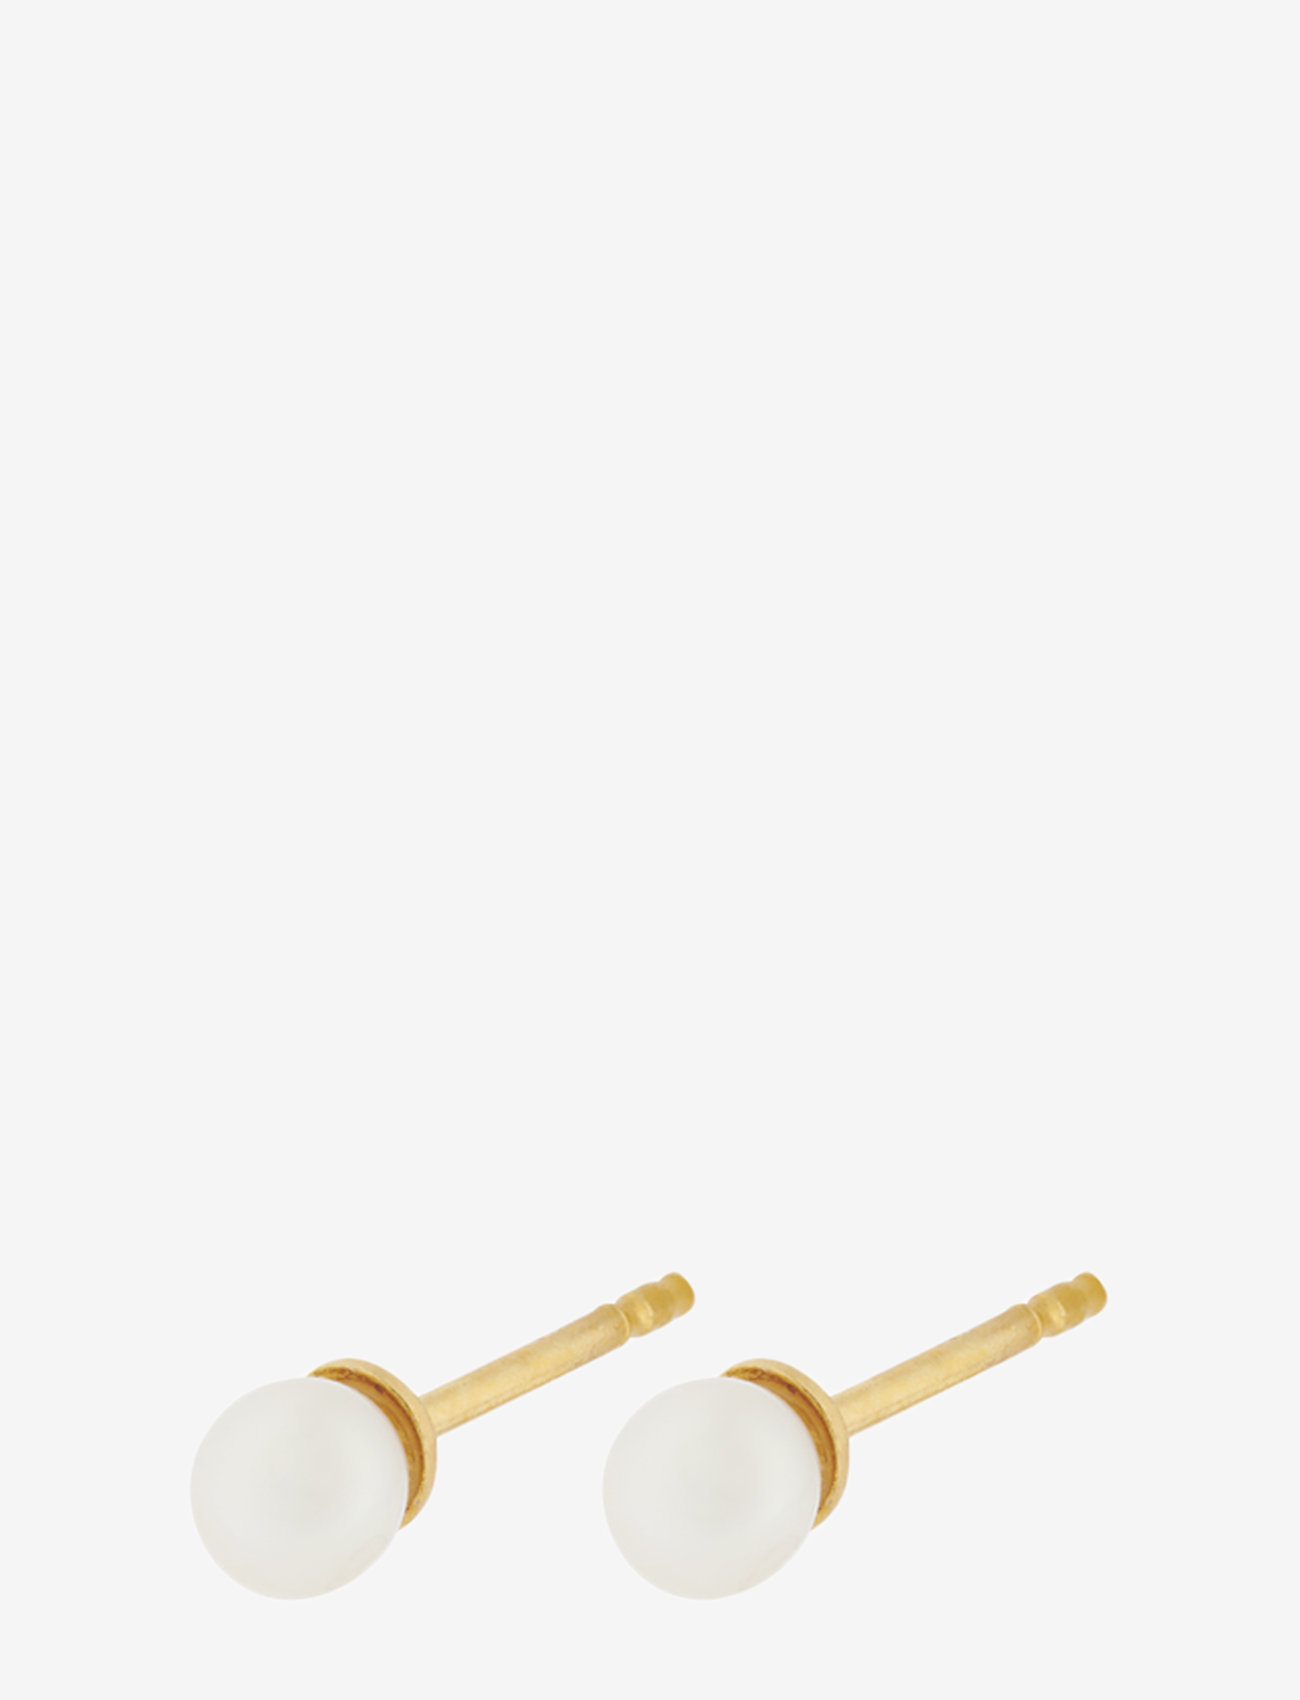 Pernille Corydon - Lagoon Earsticks -  Fresh water pearl 4 mm - studs - gold plated - 0